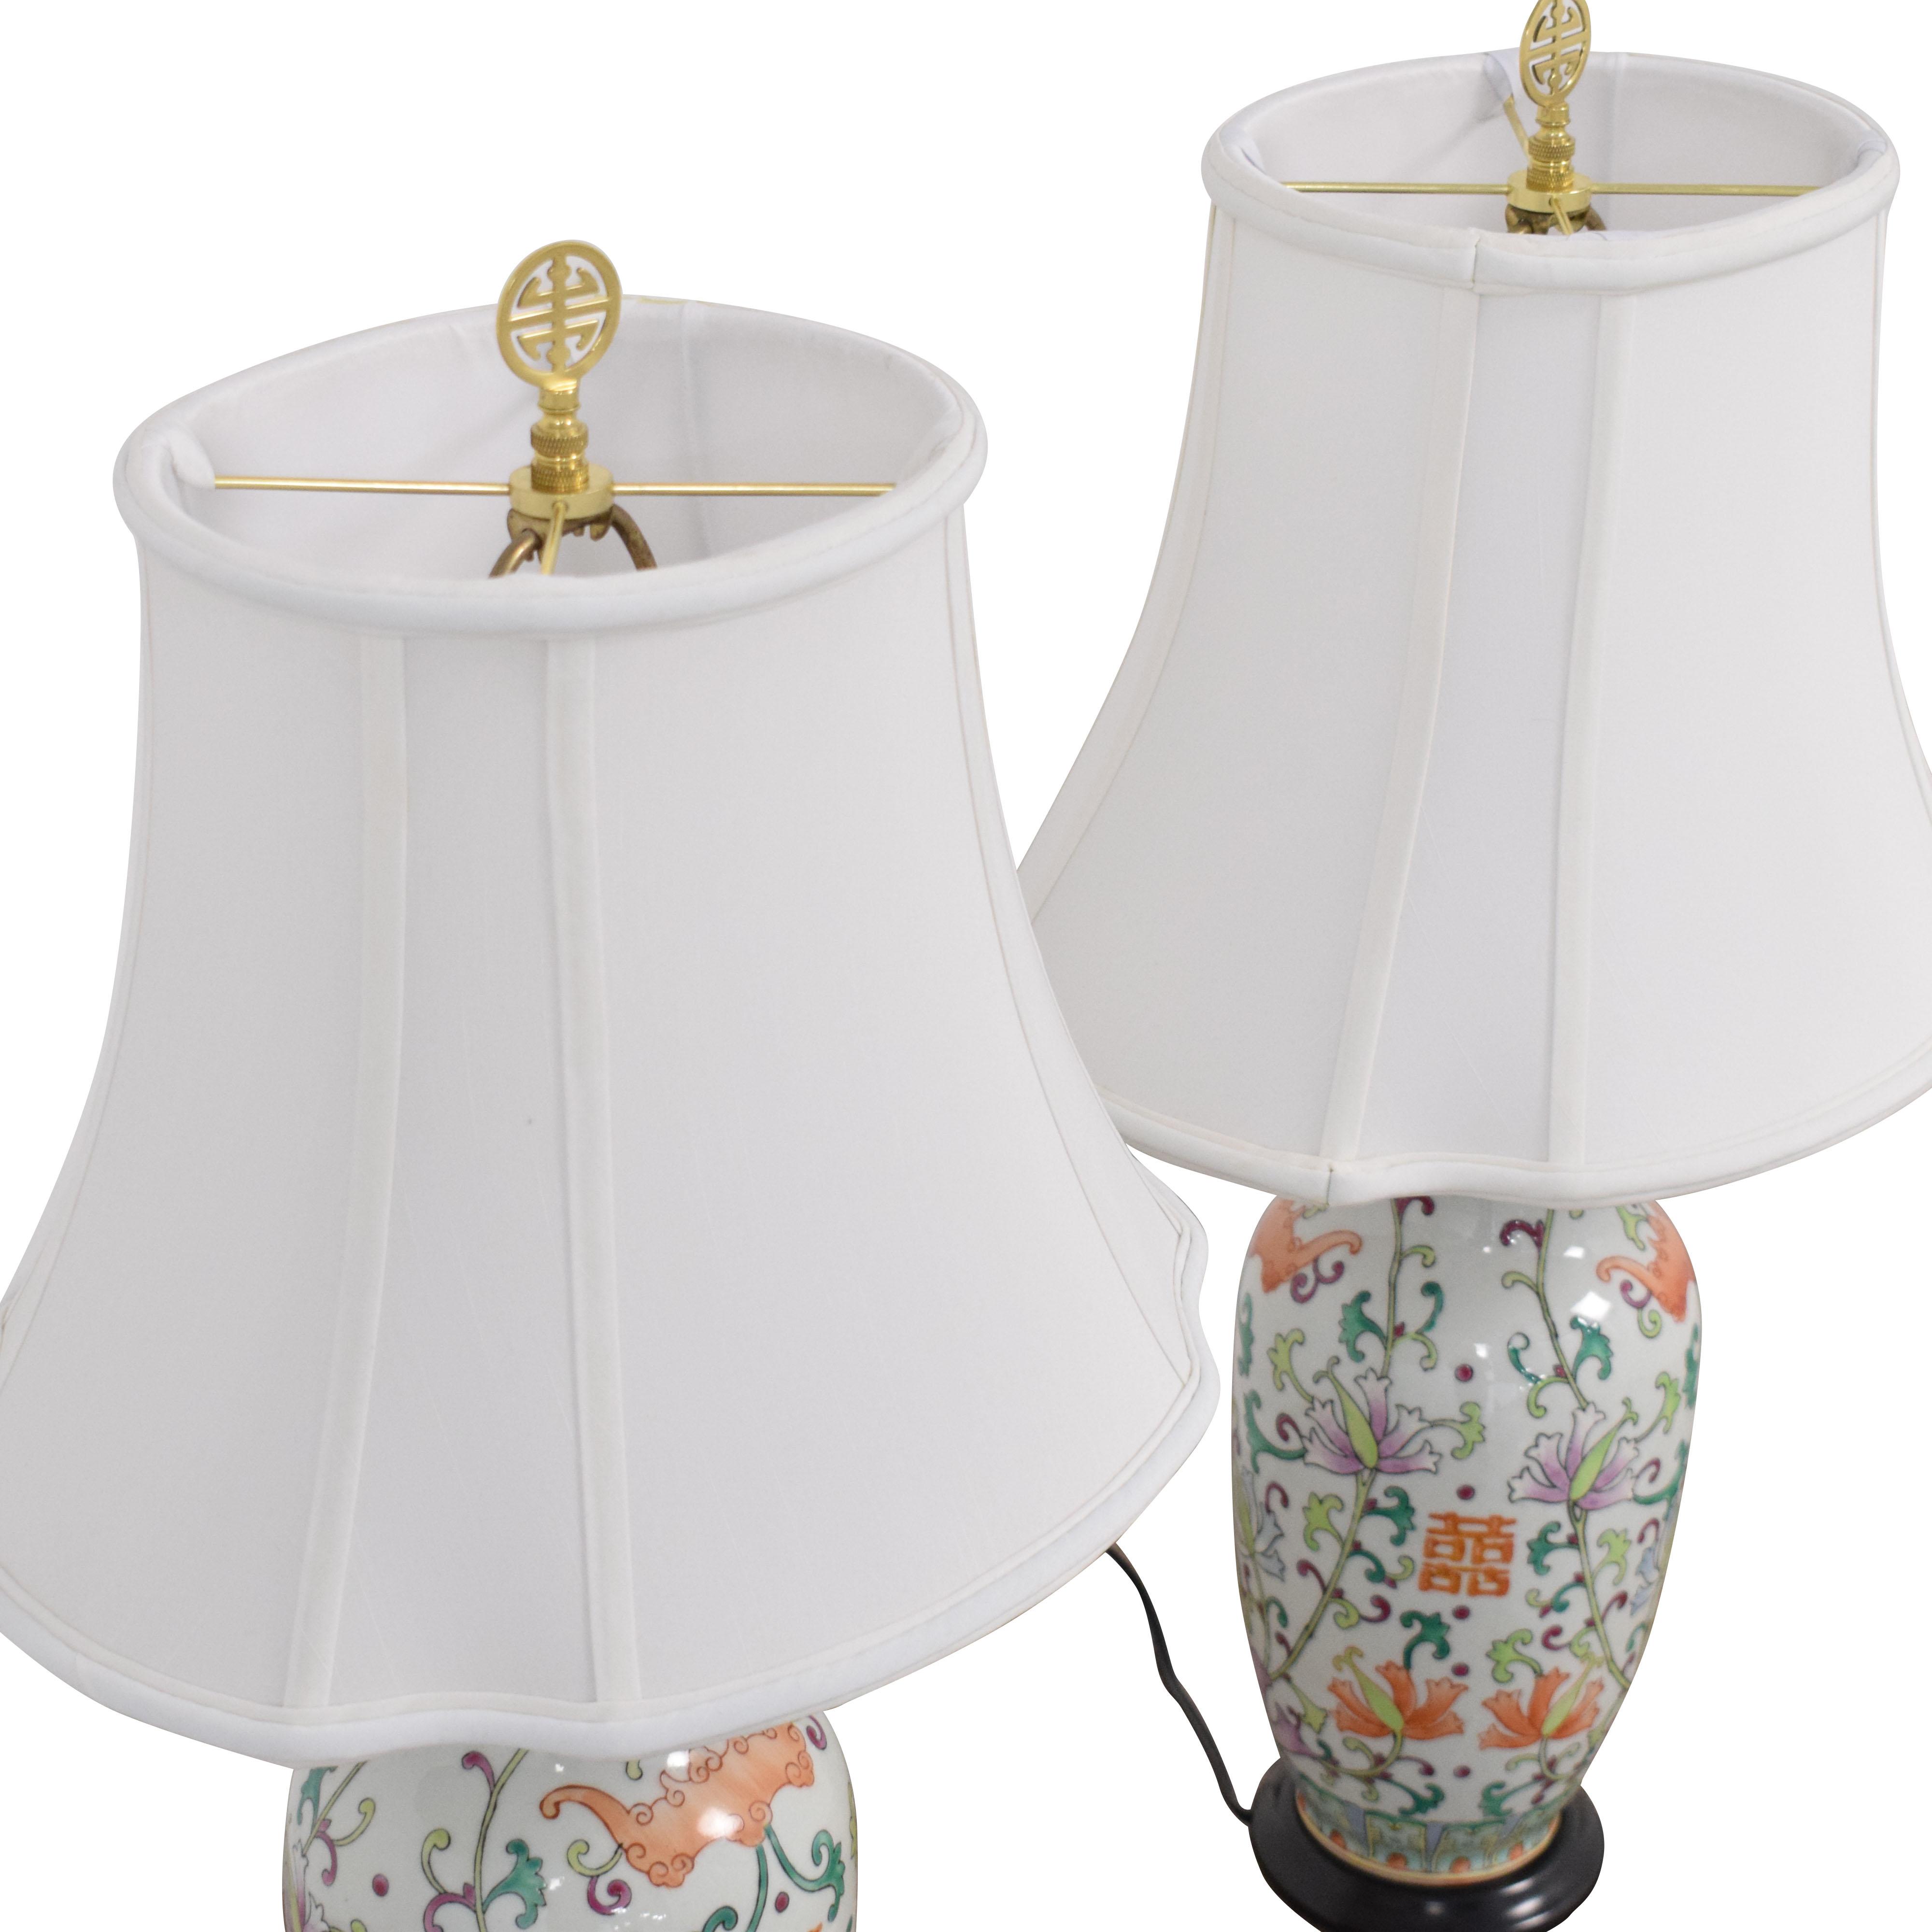 Bloomingdale's Bloomingdale's Floral Table Lamps second hand